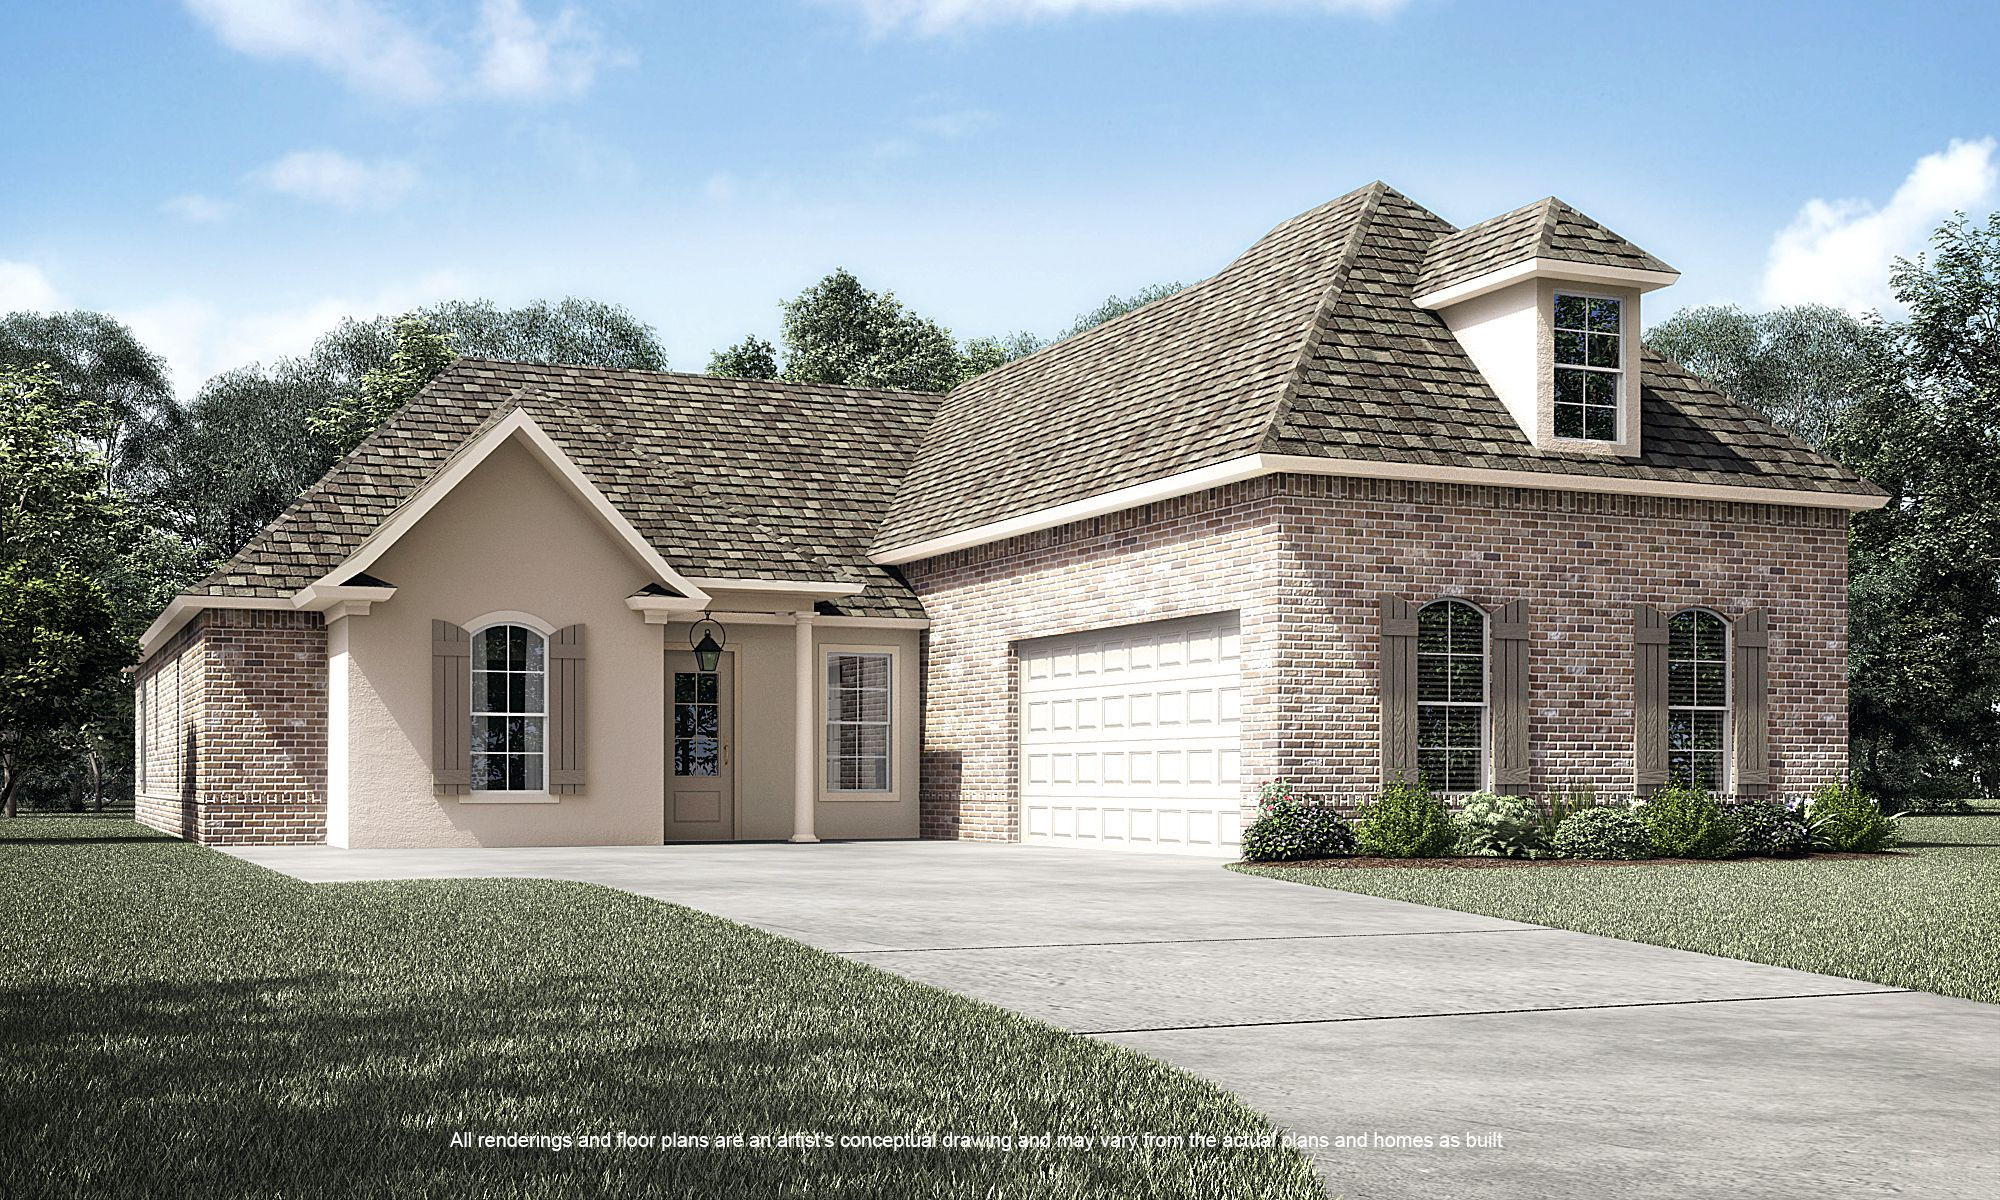 Single Family for Sale at Pine Creek - Melrose D E 304 Cedar Creek Dr. Madisonville, Louisiana 70447 United States